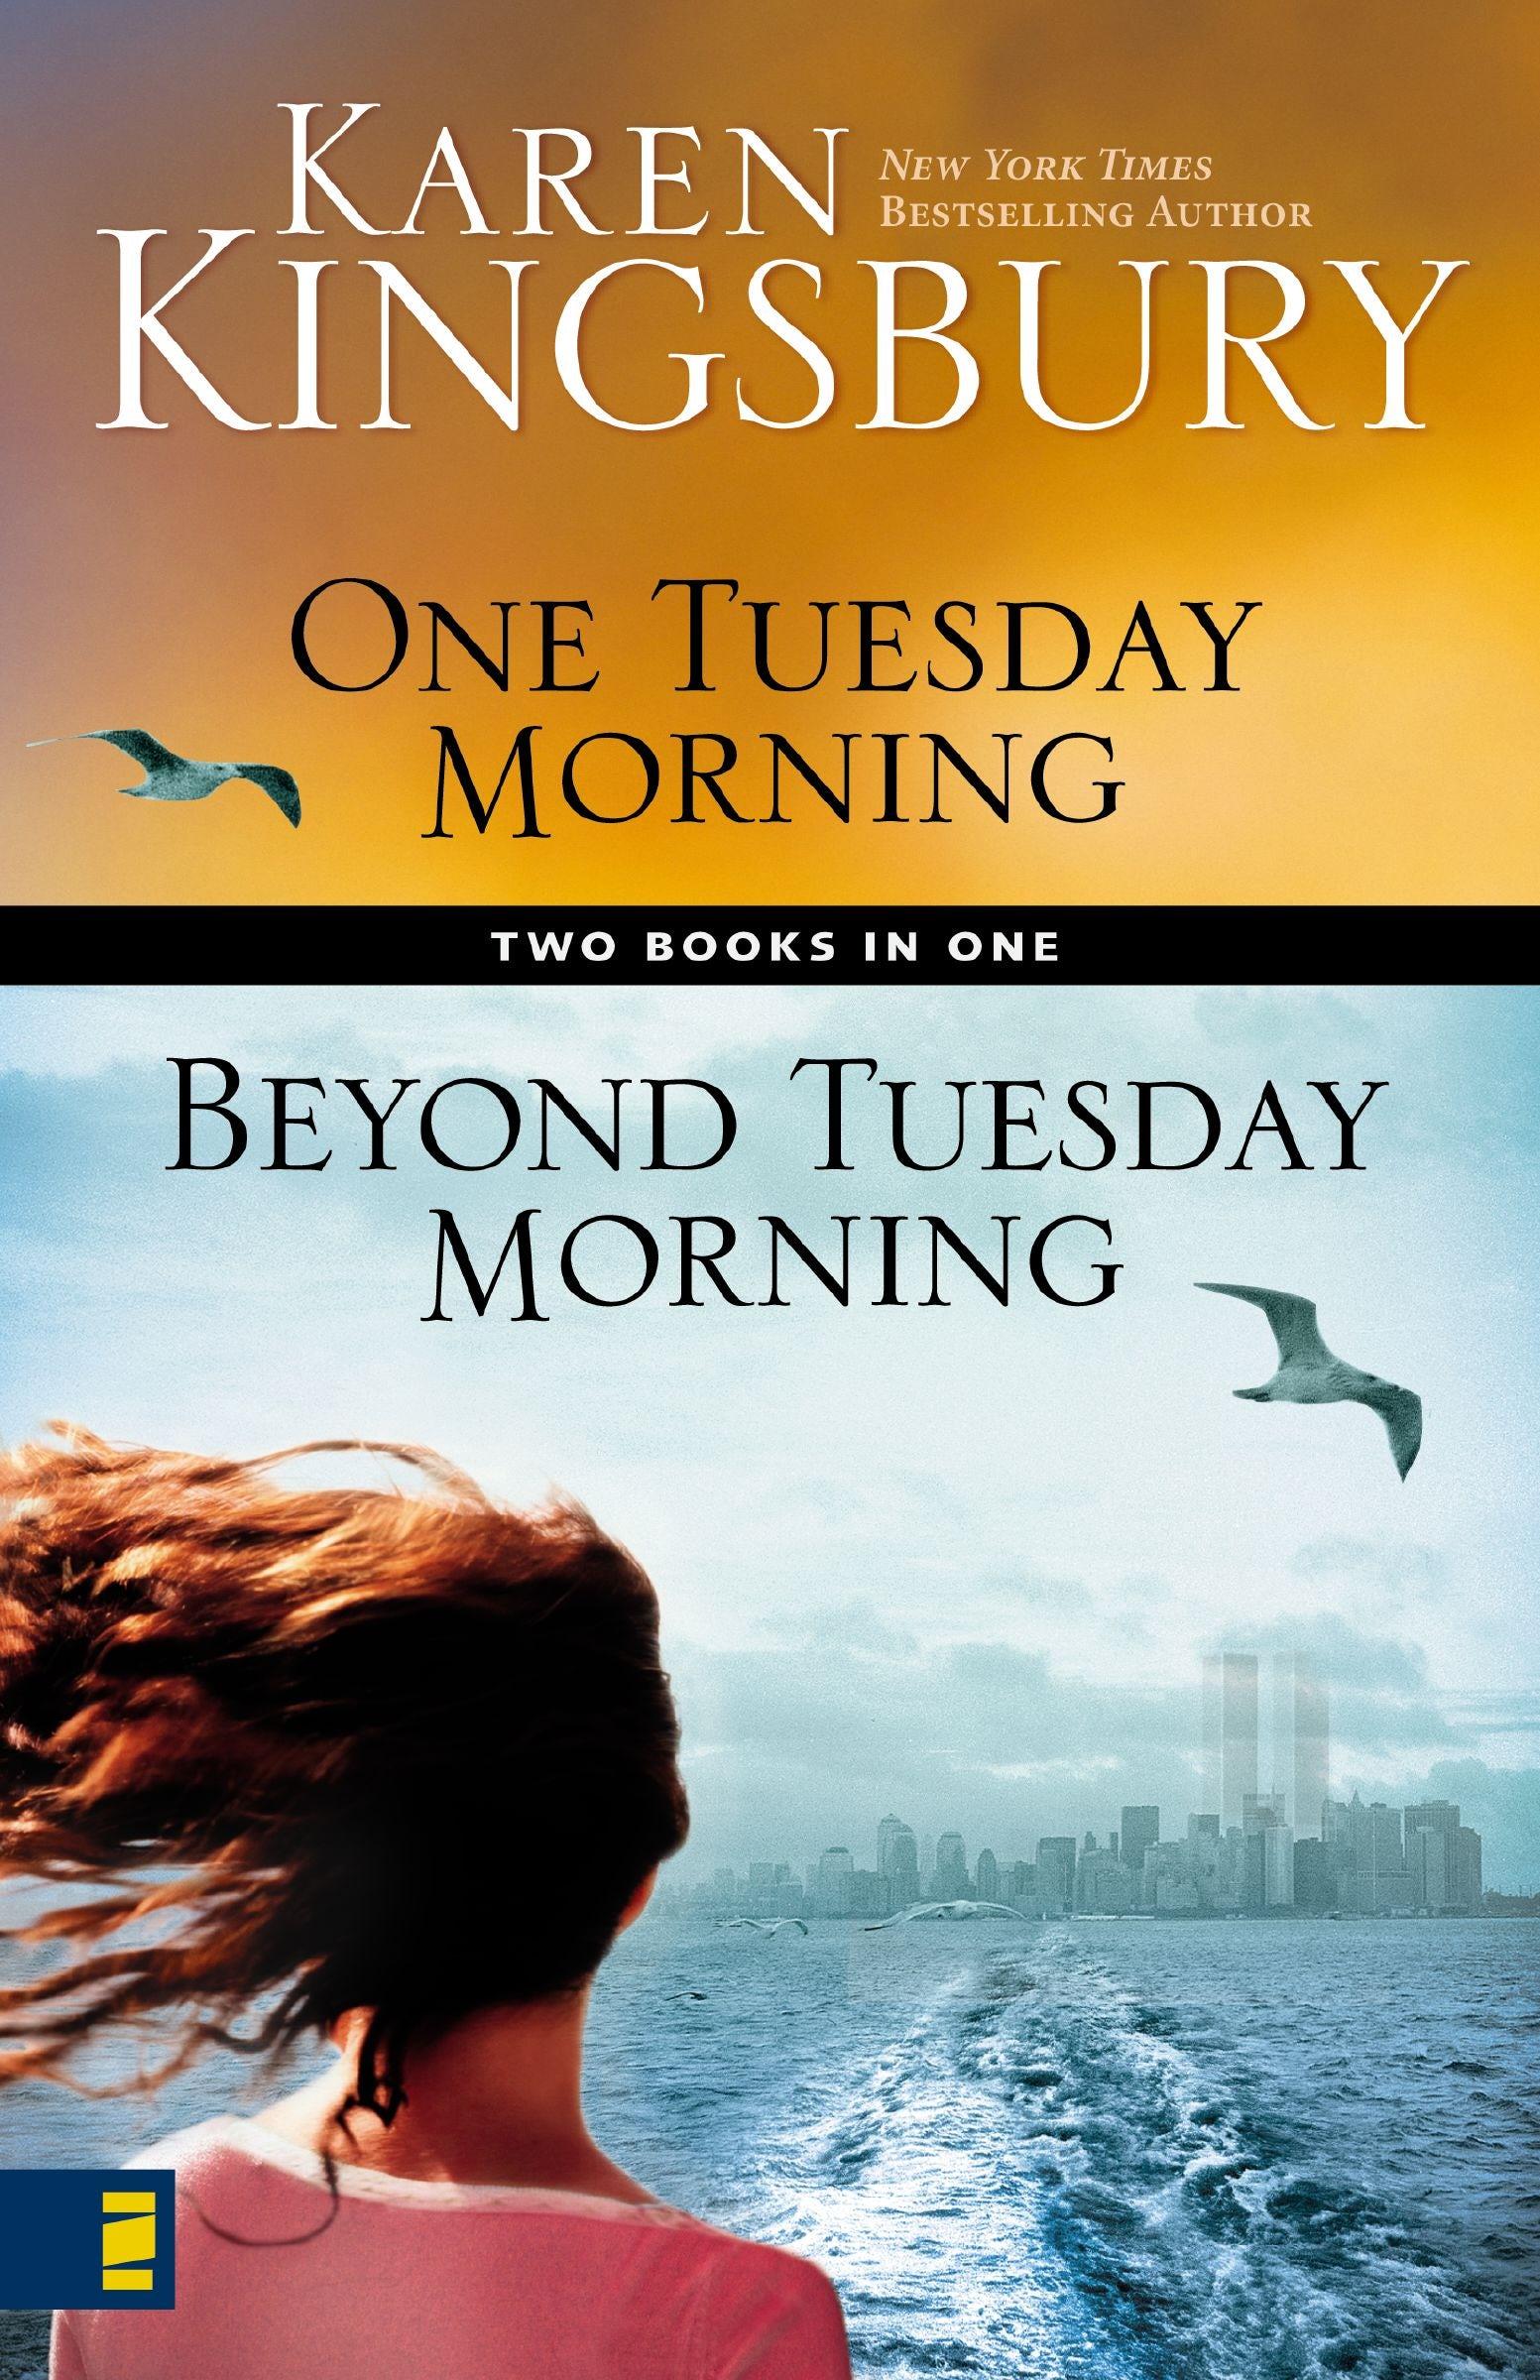 One Tuesday Morning 911 1 By Karen Kingsbury